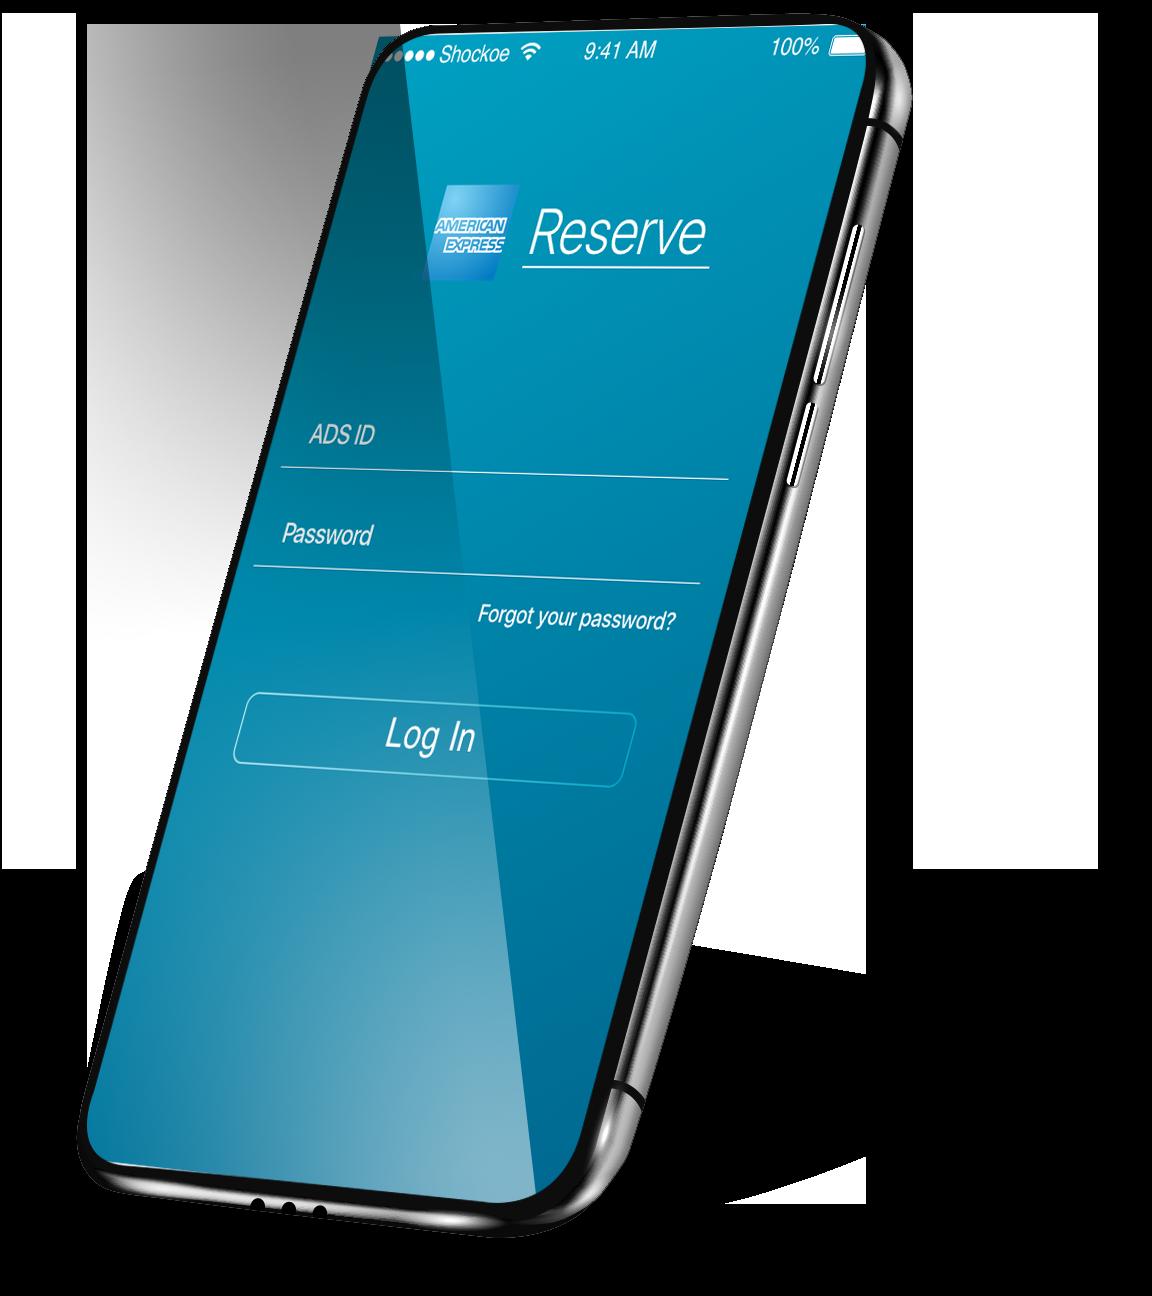 American Express mobile app